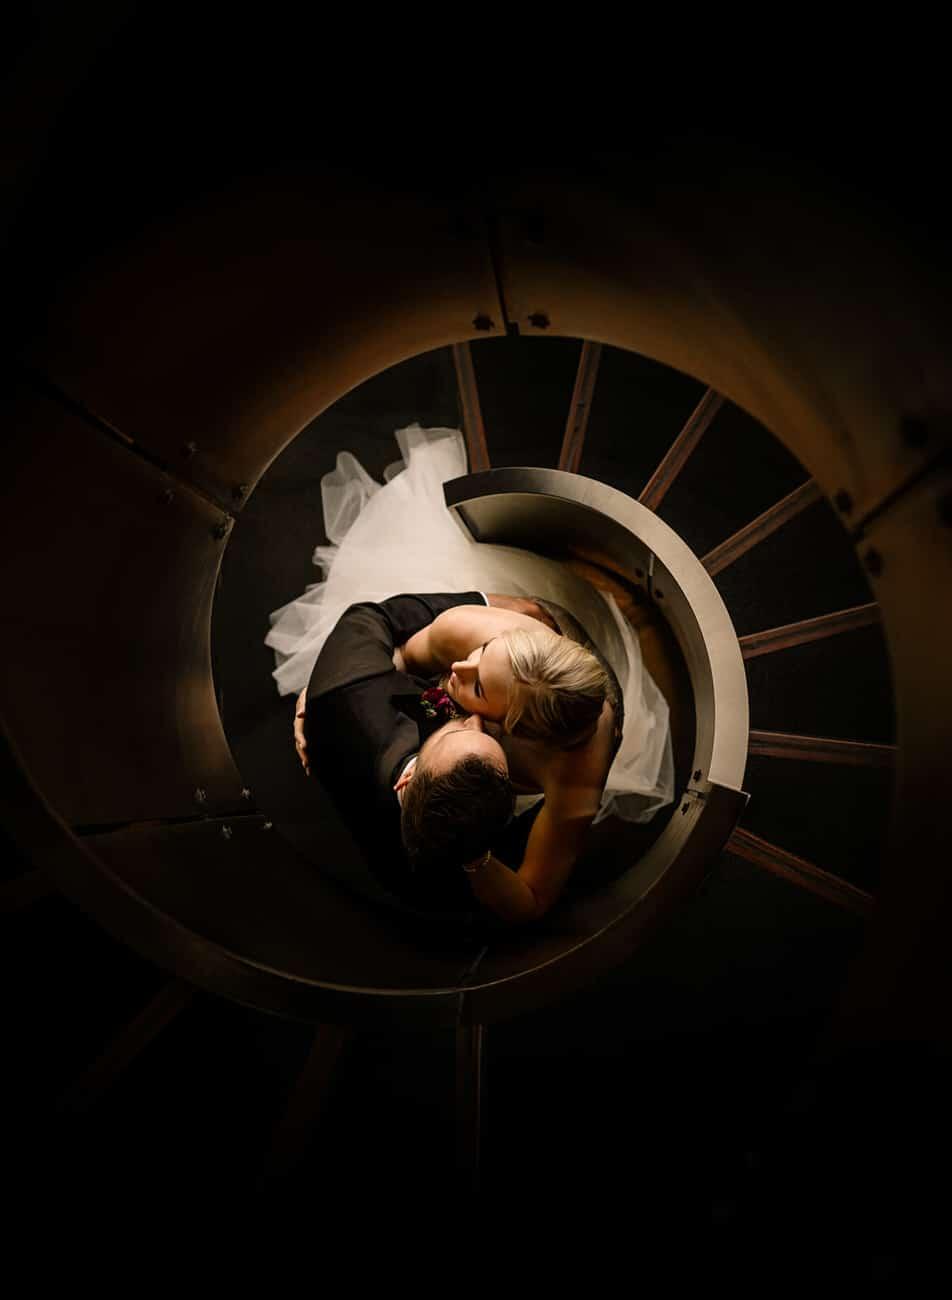 A Bride & Groom in Le Germain Hotel in Calgary wedding portrait photograph